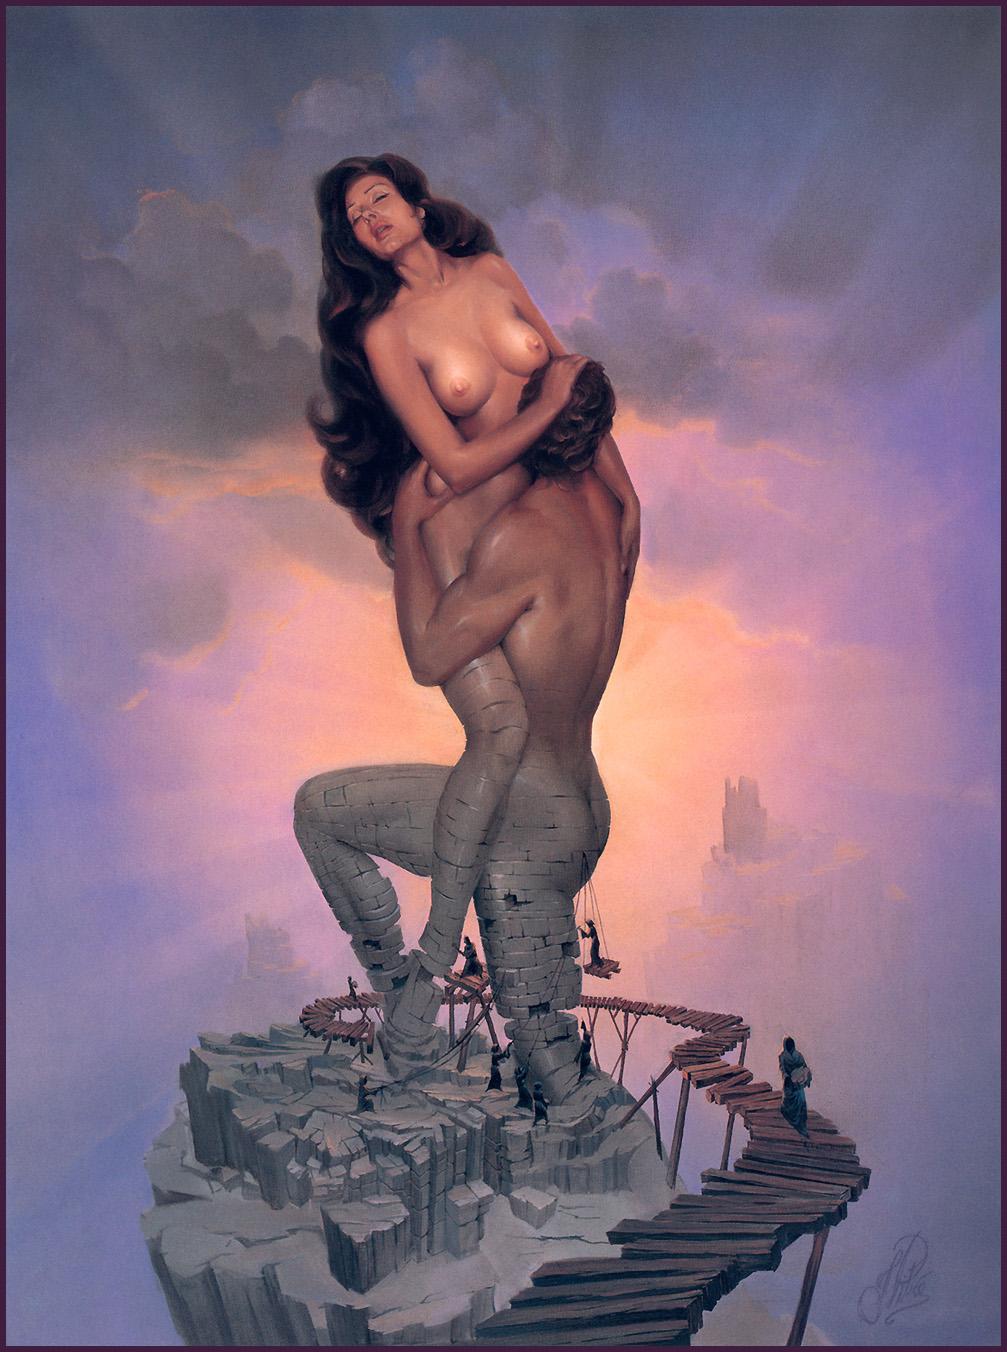 eroticheskie-fantazii-kakie